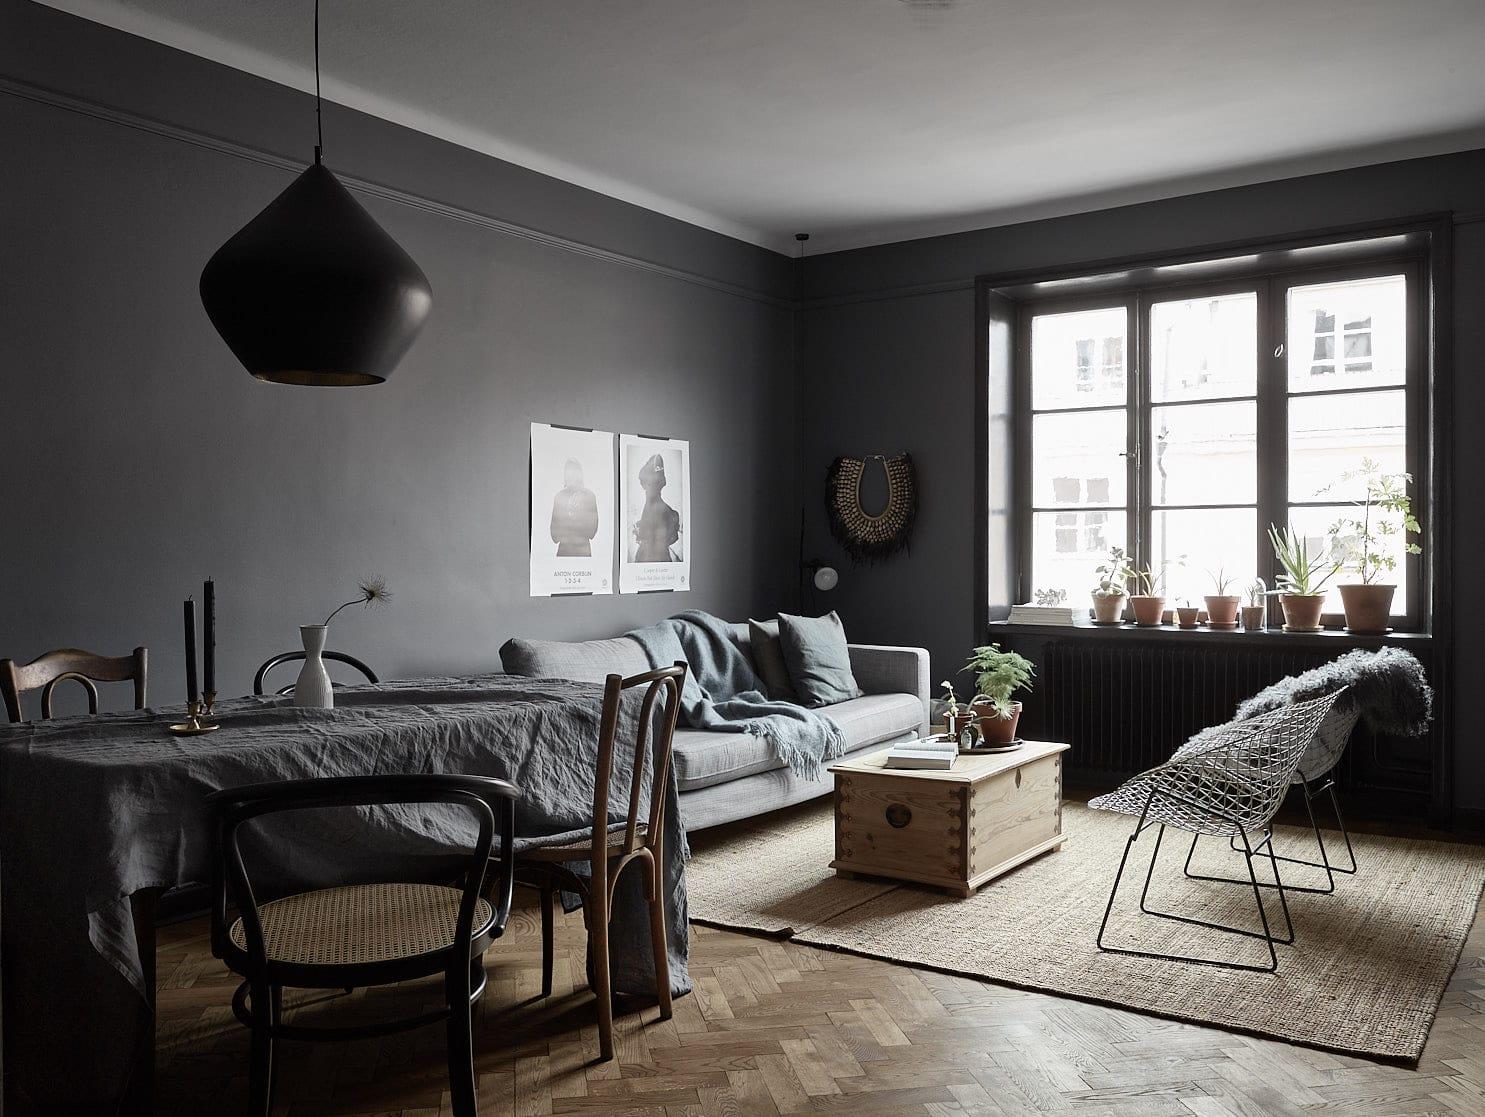 A beautiful home in dark colors COCO LAPINE DESIGNCOCO LAPINE DESIGN